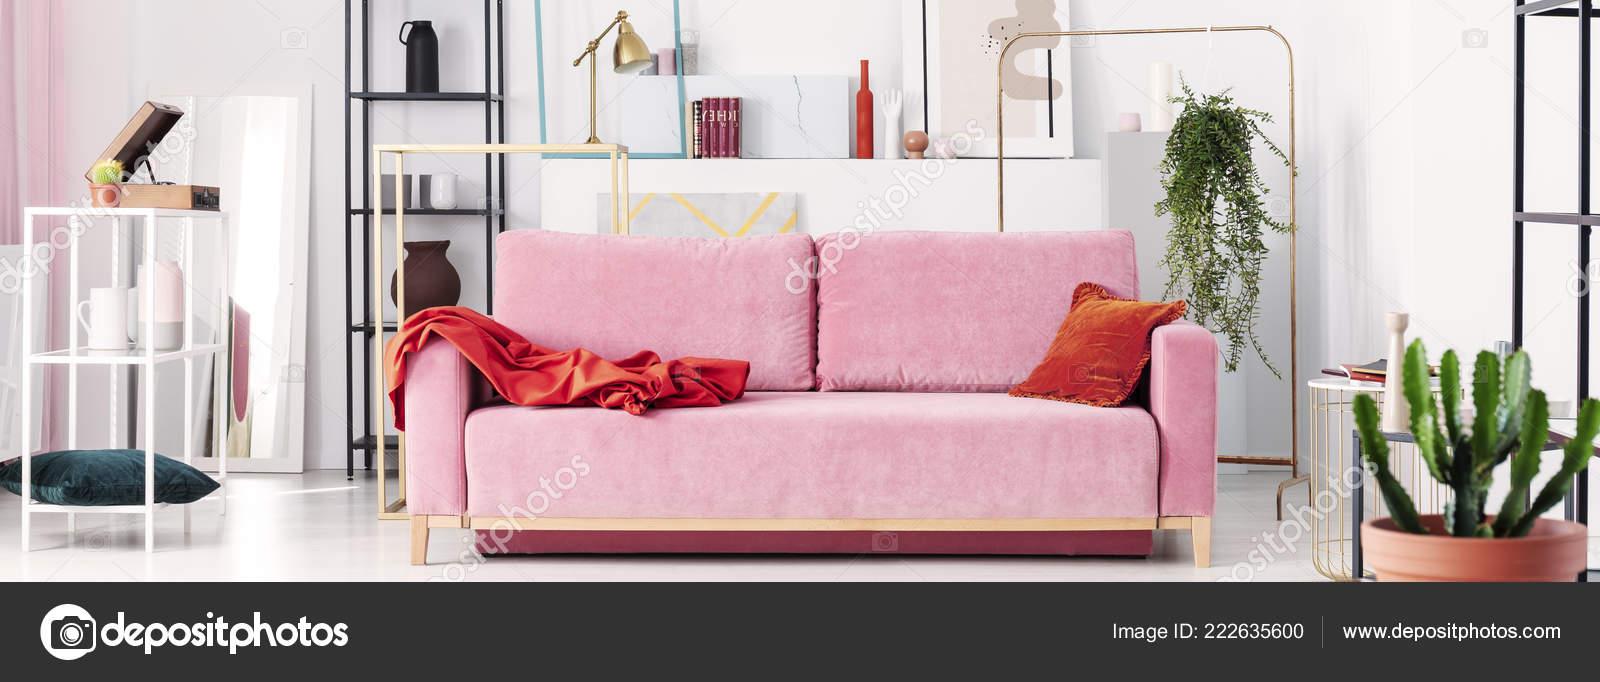 Panoramic View Powder Pink Sofa White Black Metal Shelves Paintings